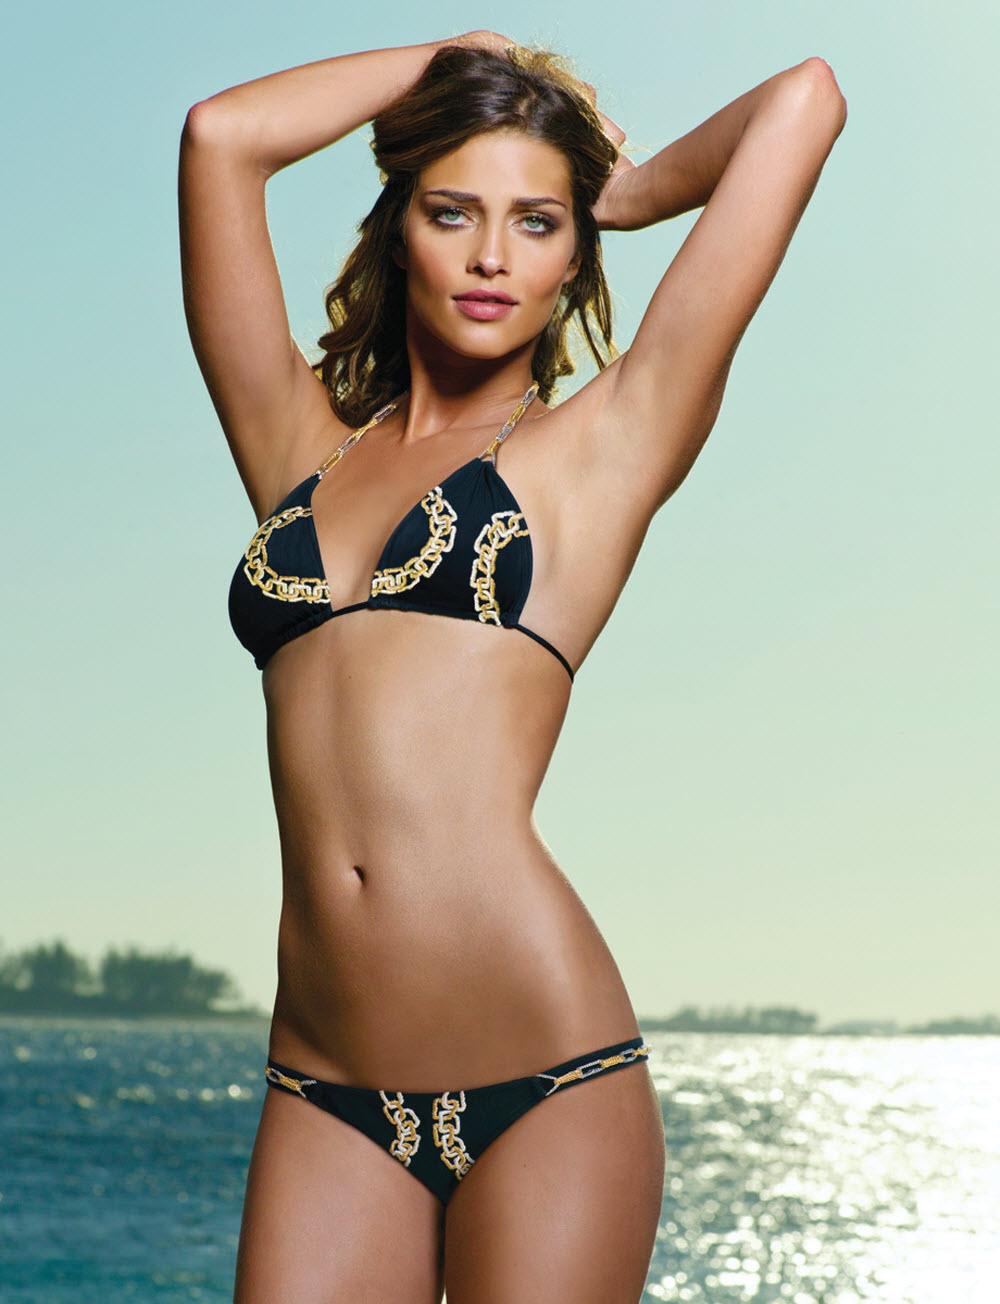 Bikini Ana Beatriz Barros nudes (47 photo), Ass, Bikini, Selfie, bra 2006